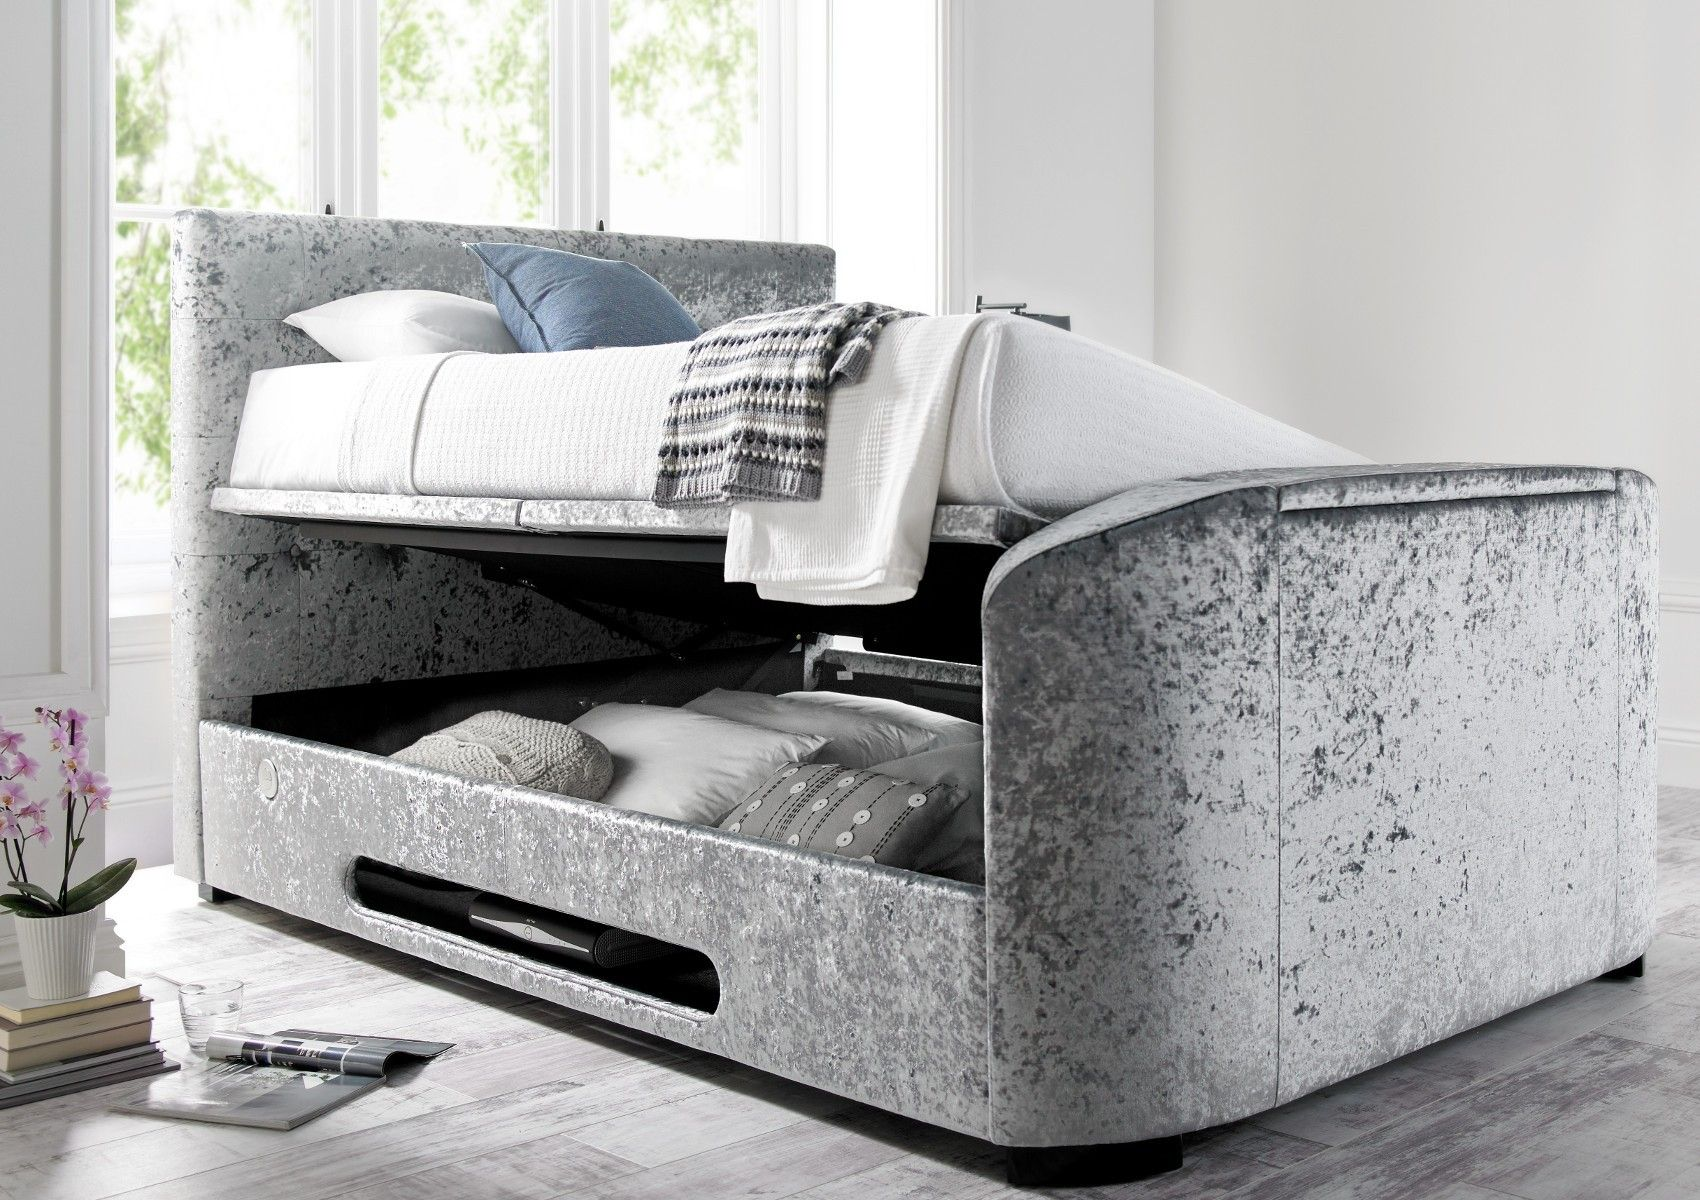 Awe Inspiring The Kingston Ottoman Tv Bed In Platinum Crushed Velvet Will Creativecarmelina Interior Chair Design Creativecarmelinacom